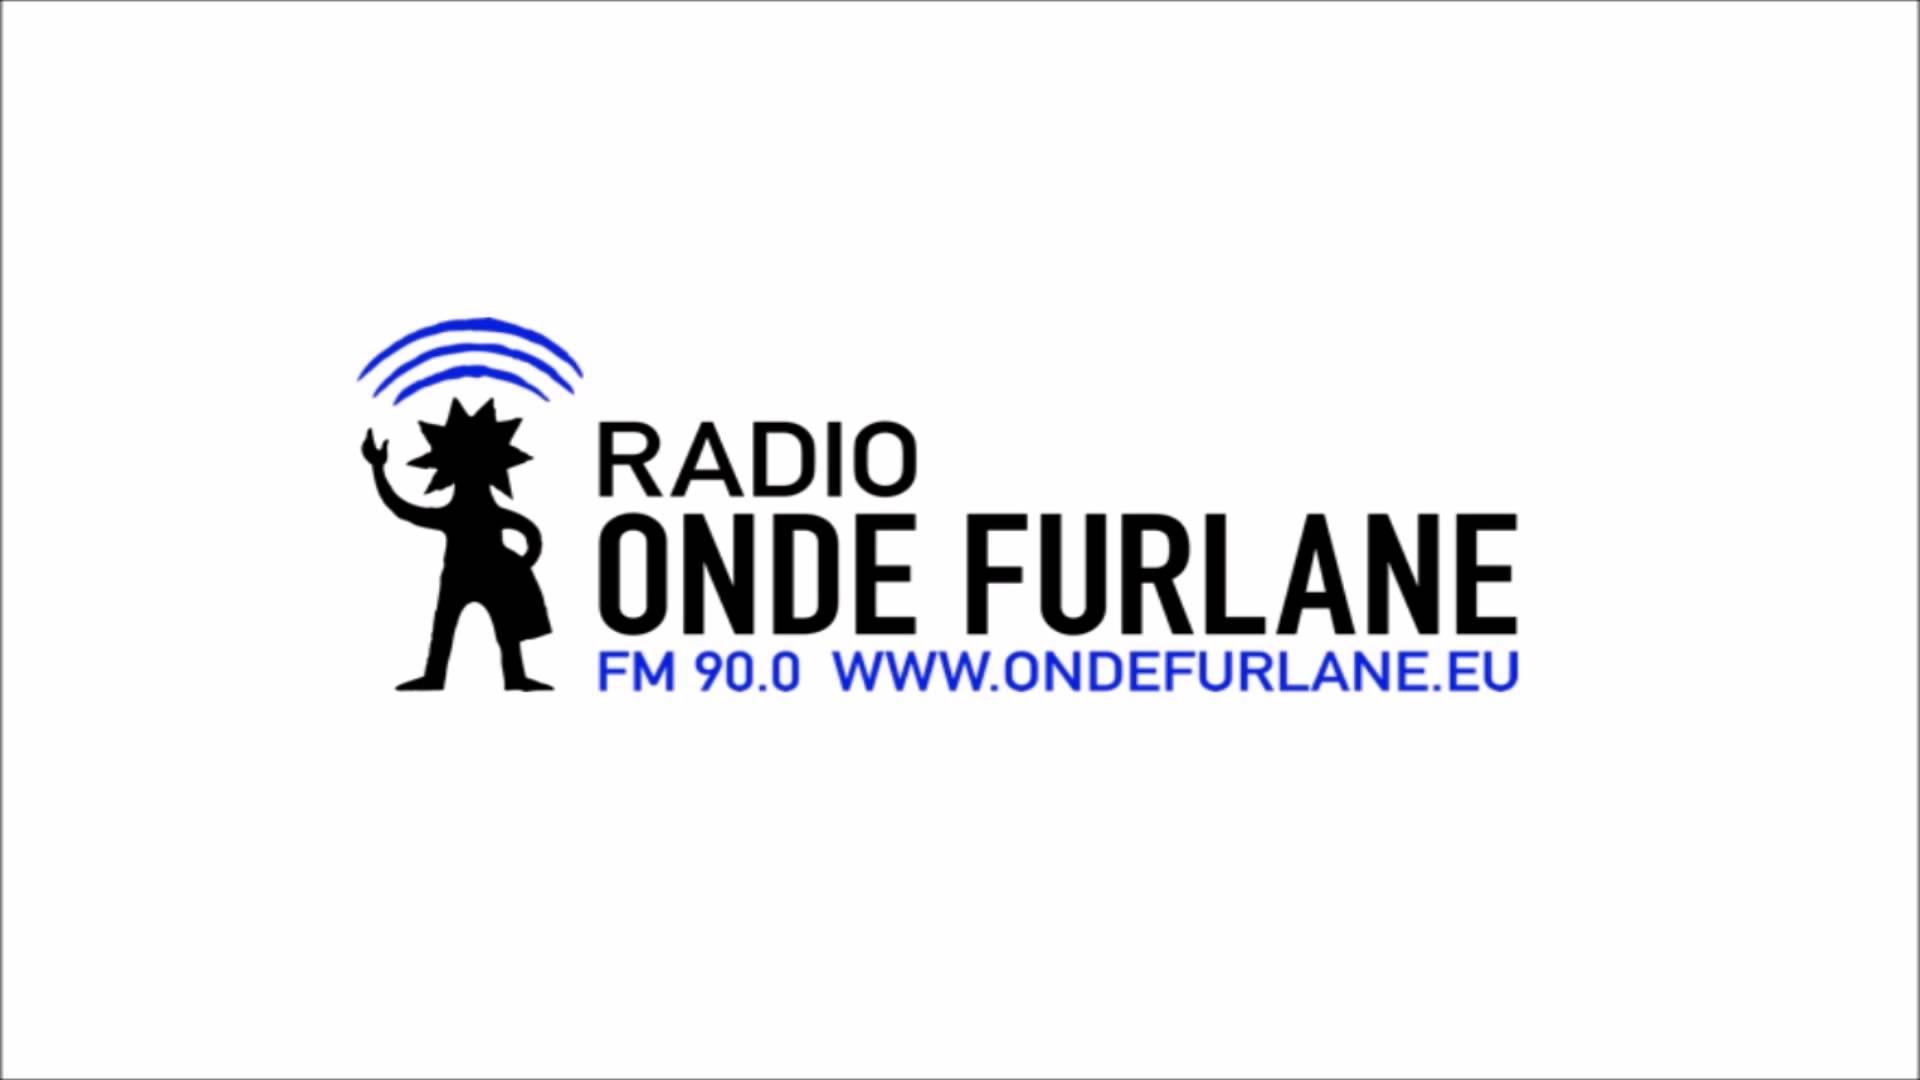 Radio Onde Furlane